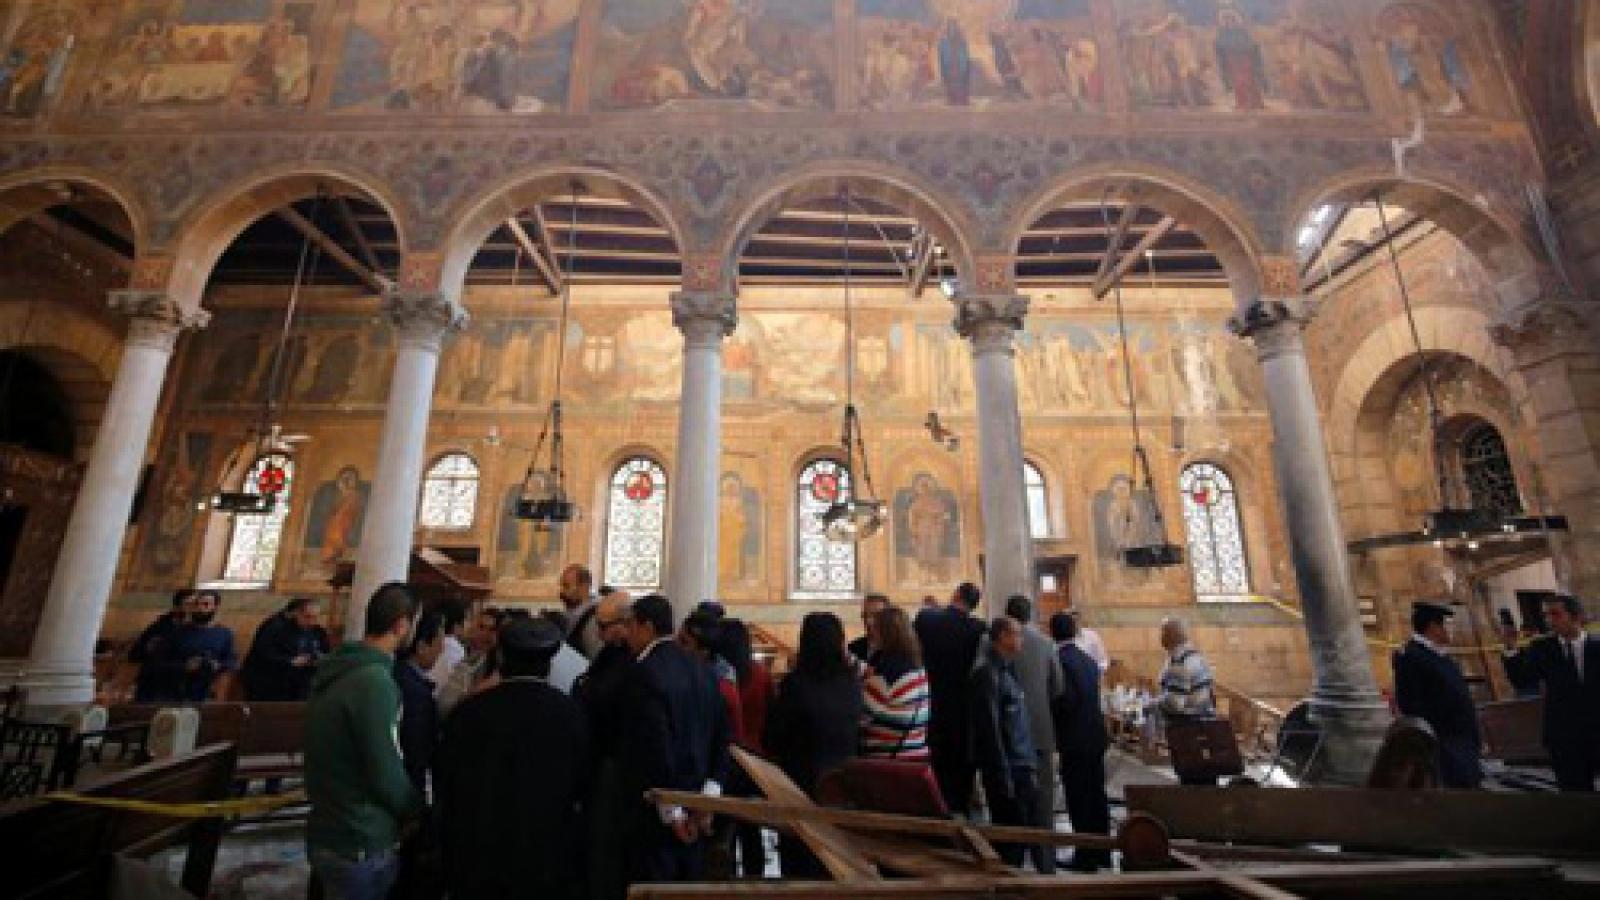 Cairo church bombing kills 25, raises fears among Christians